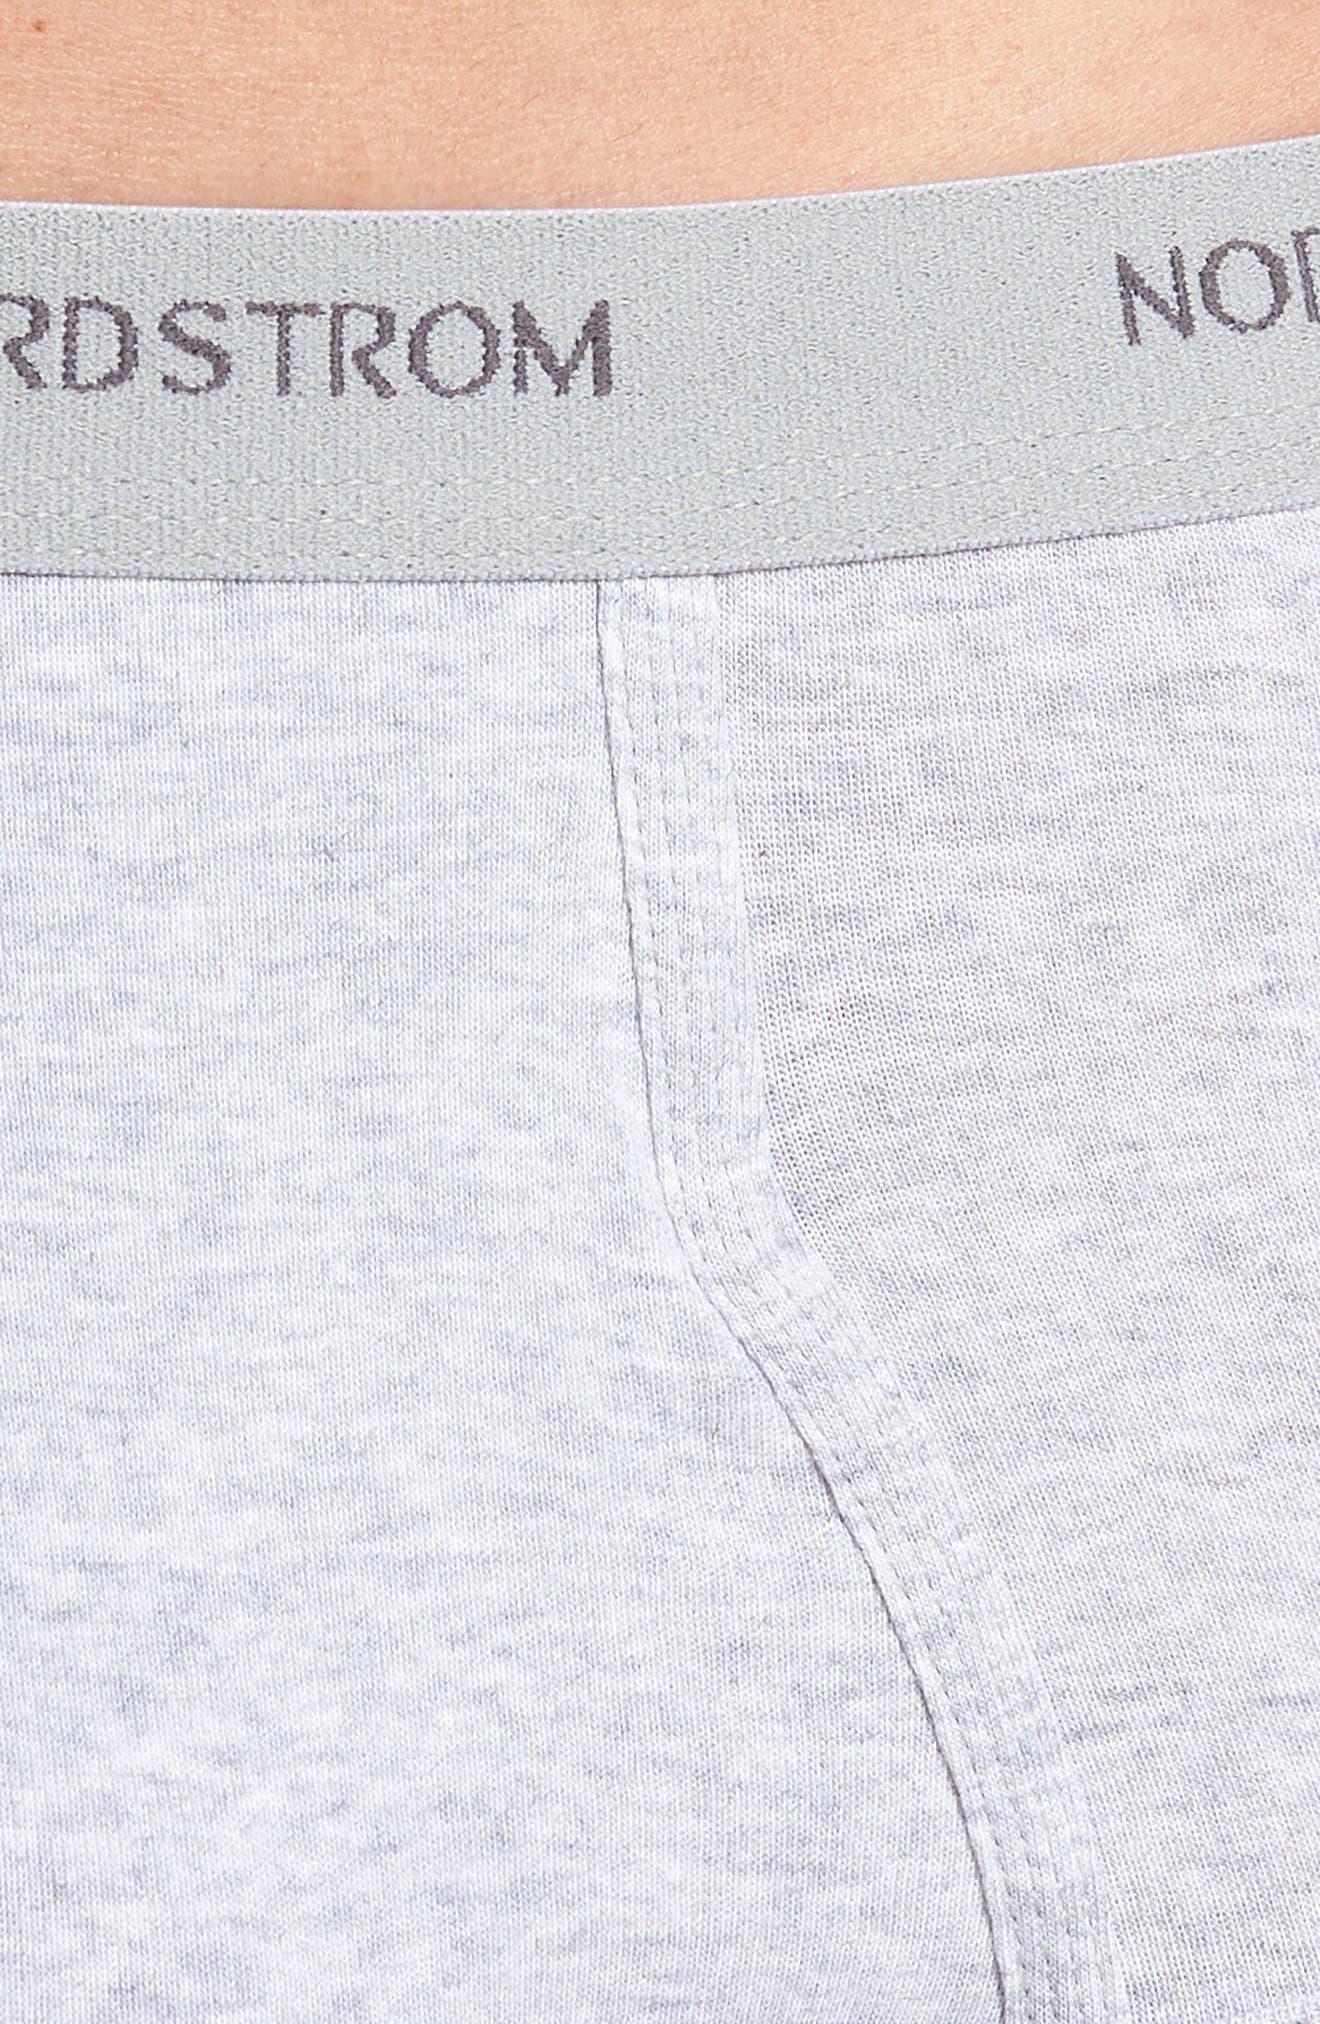 NORDSTROM MEN'S SHOP, 4-Pack Supima<sup>®</sup> Cotton Briefs, Alternate thumbnail 5, color, BLACK/ NAVY/ GREY